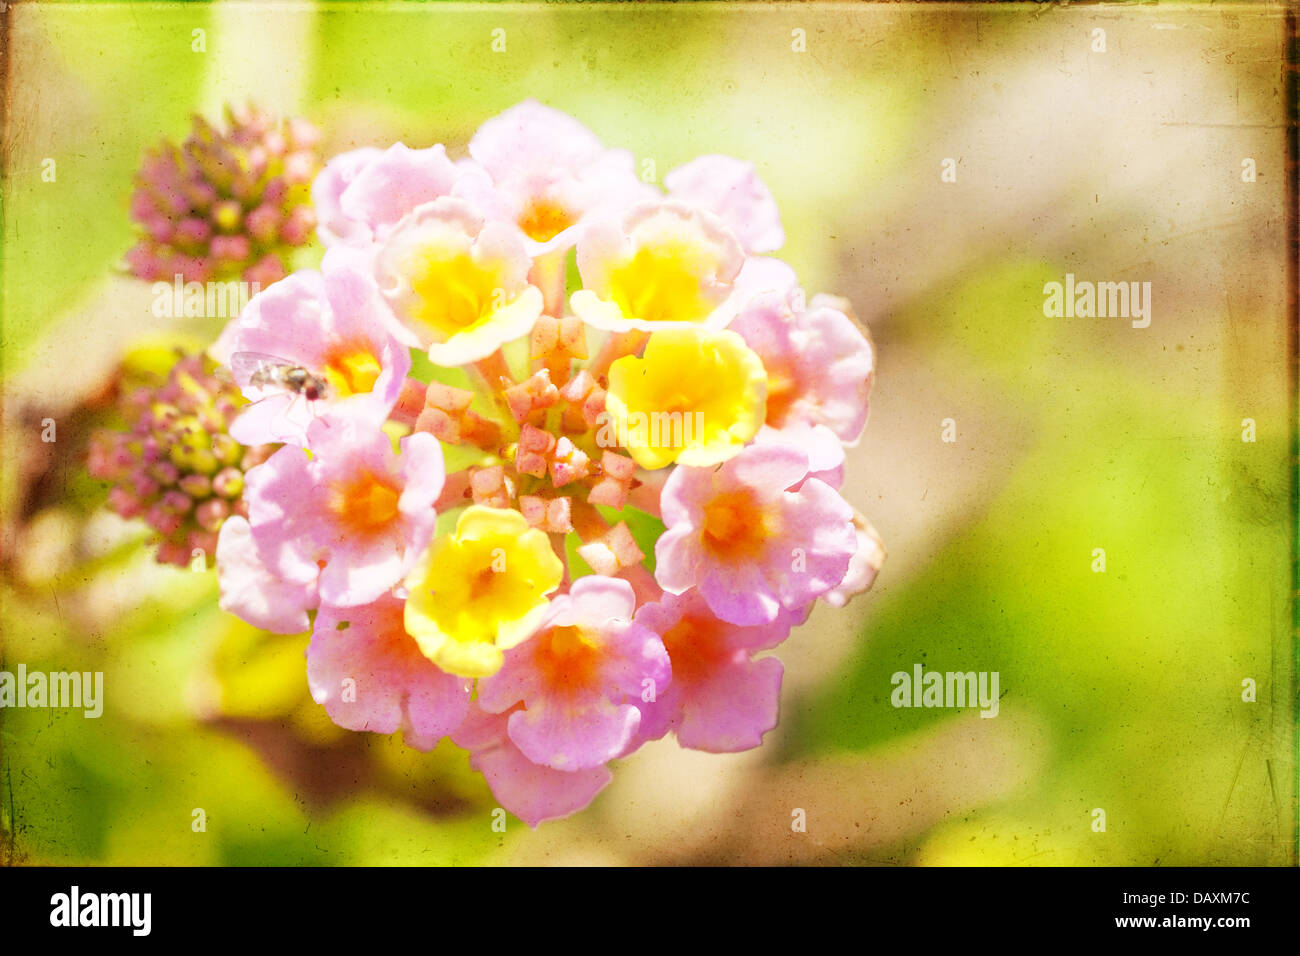 Abstract textured macro image of lantana with vintage feel - Stock Image